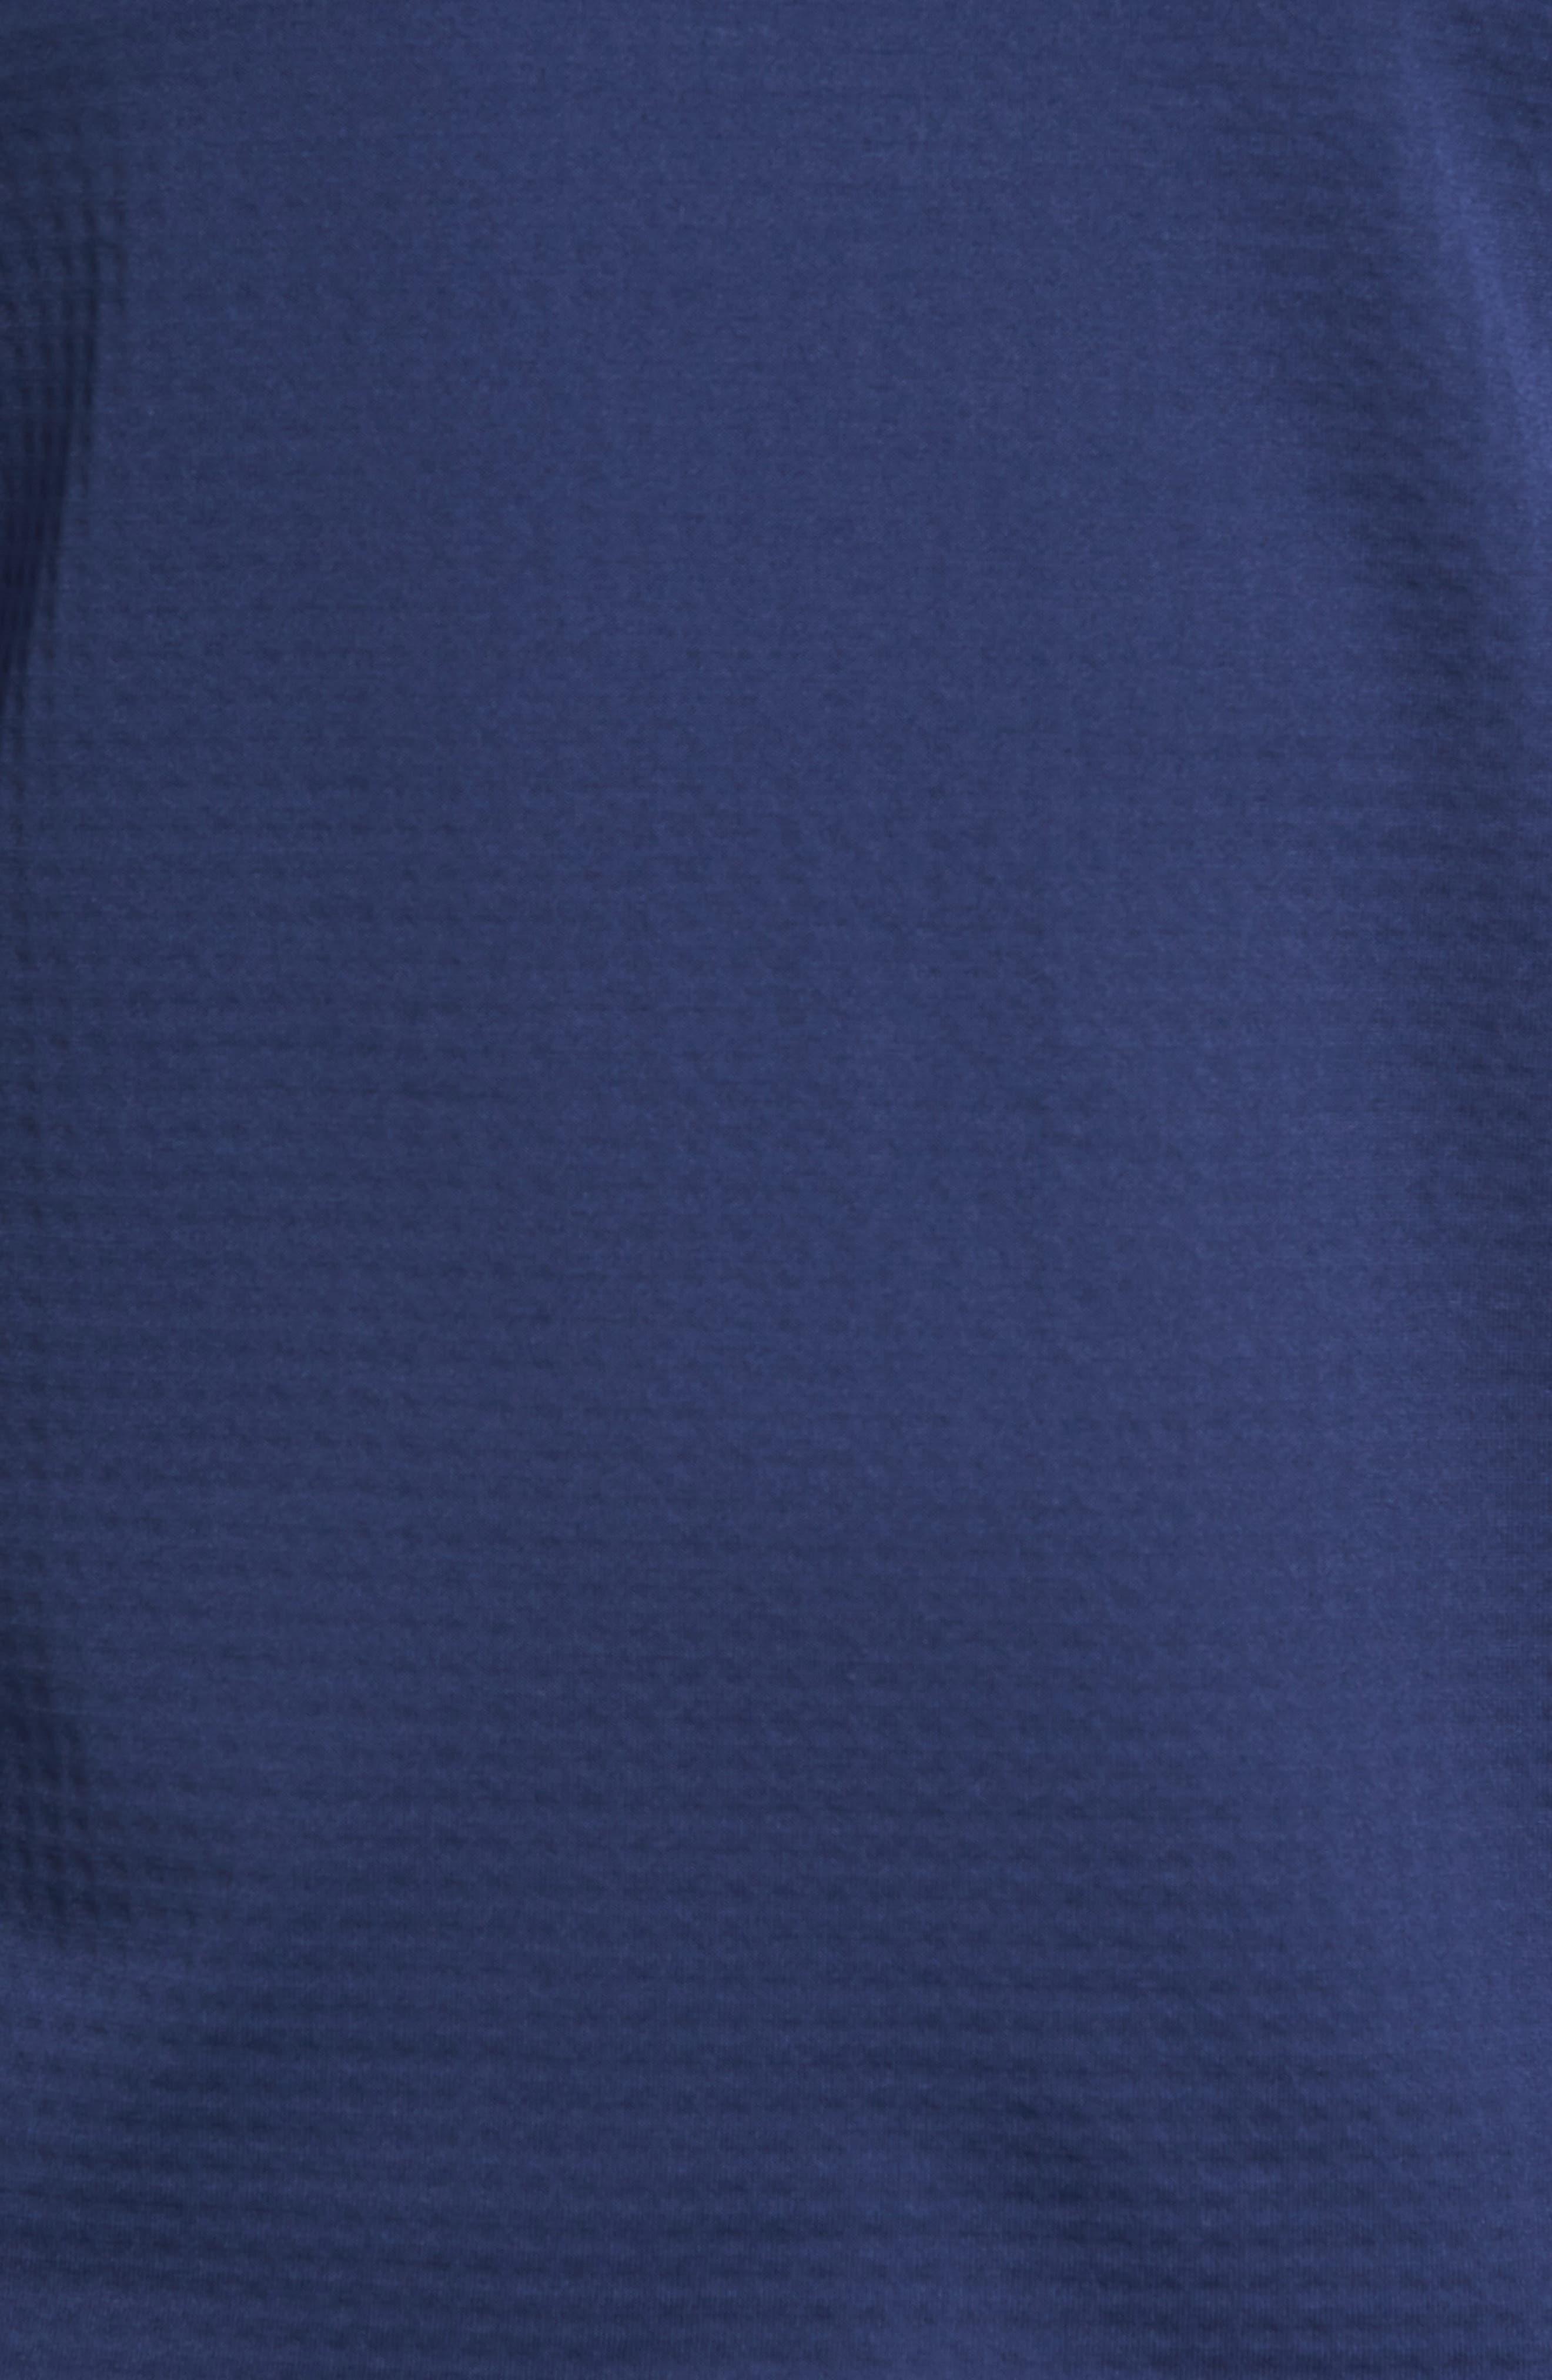 ThermaSphere Long Sleeve Running T-Shirt,                             Alternate thumbnail 9, color,                             Binary Blue/ Purple/ Heather